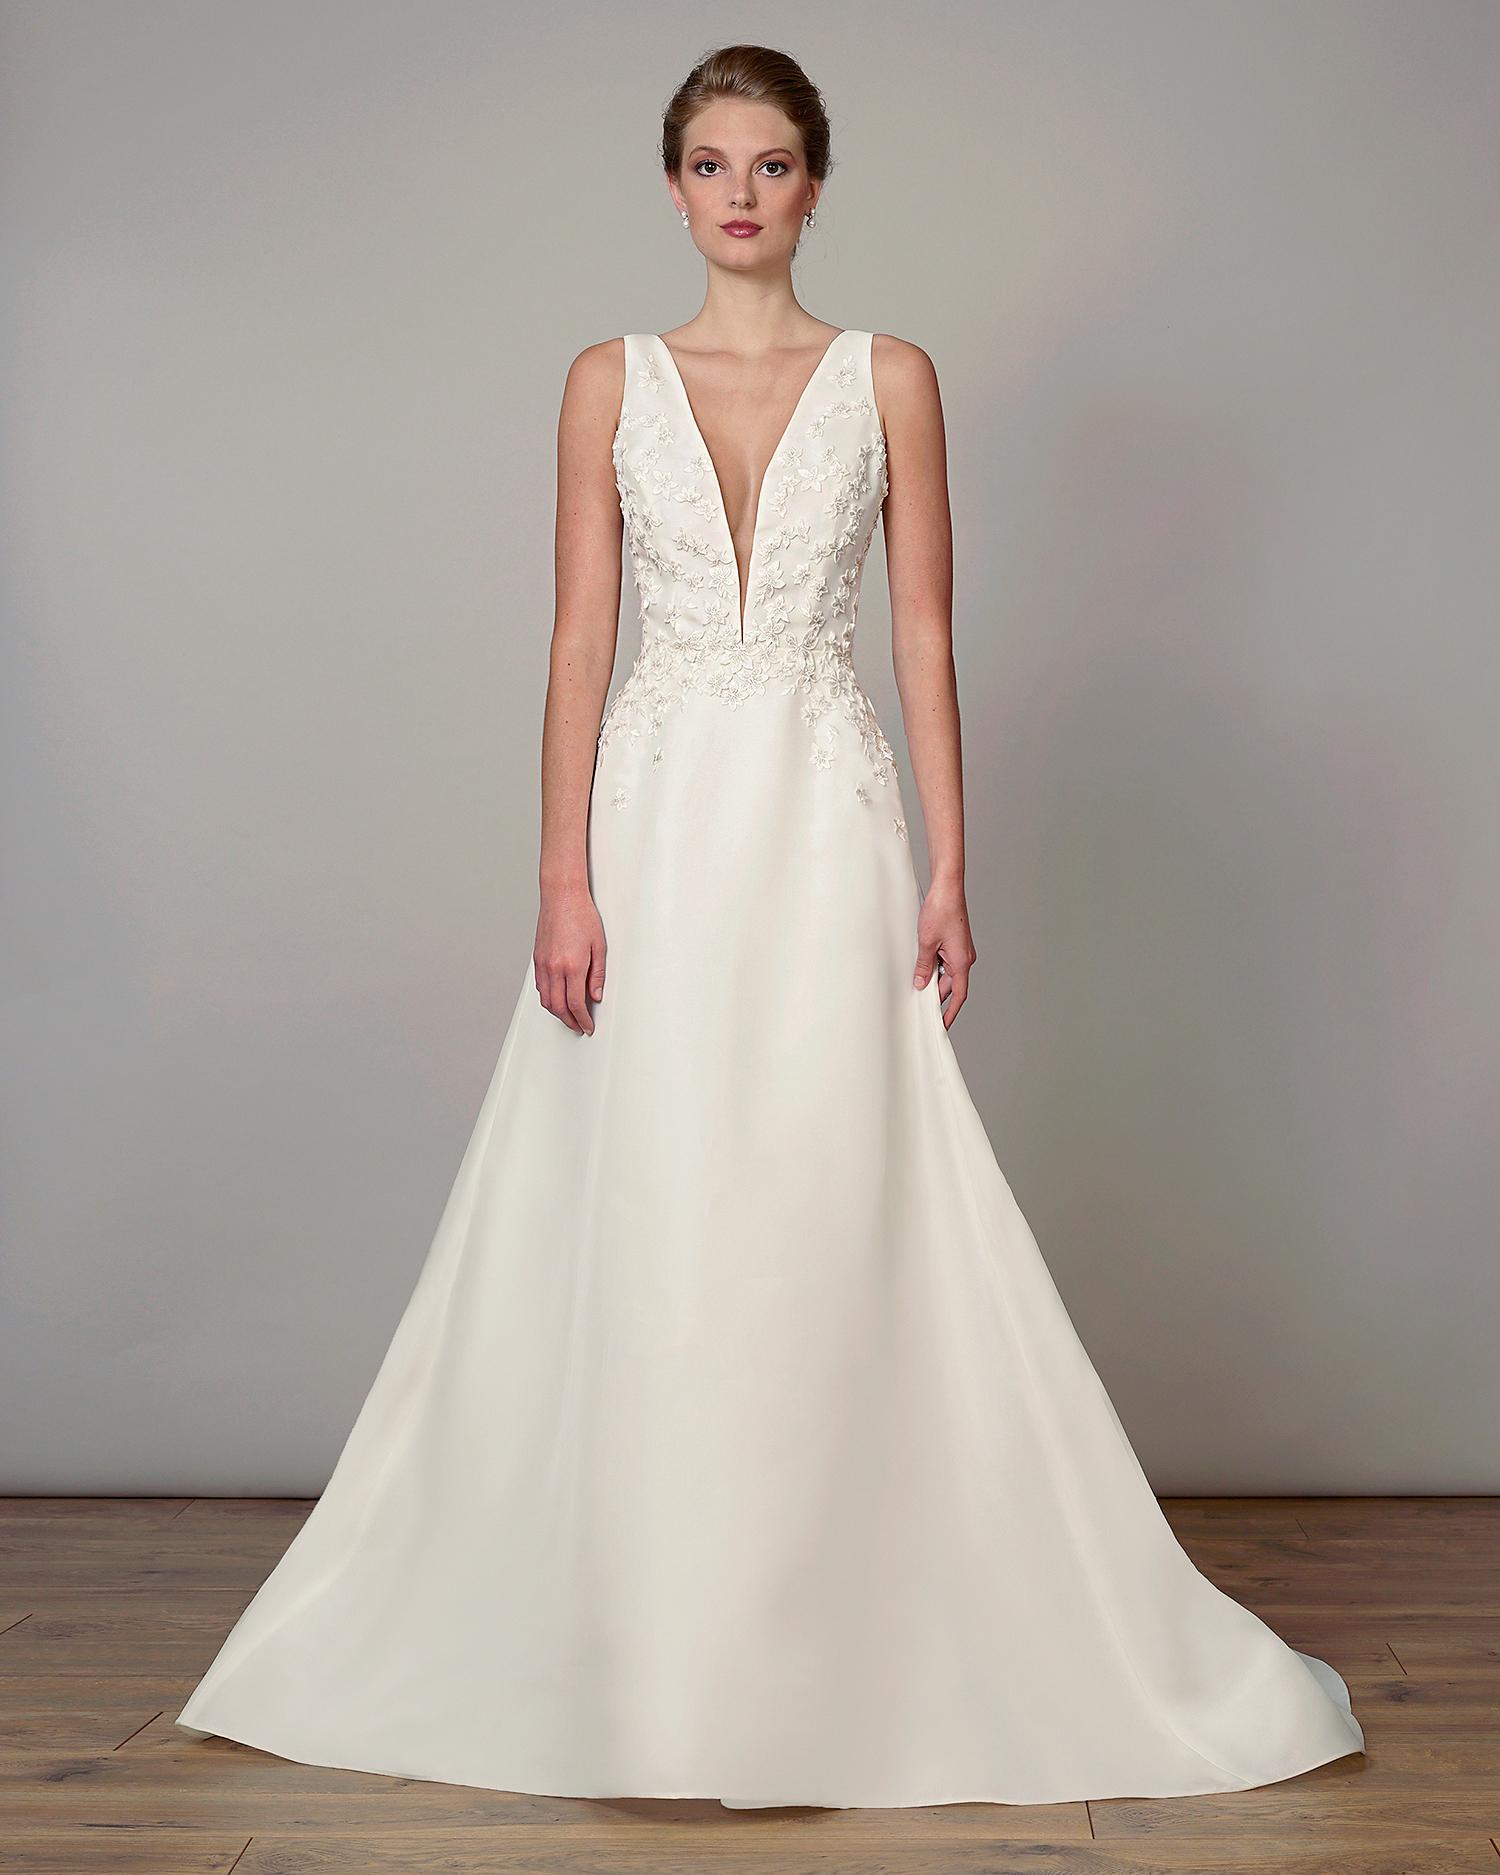 liancarlo wedding dress spring 2019 plunging applique bodice